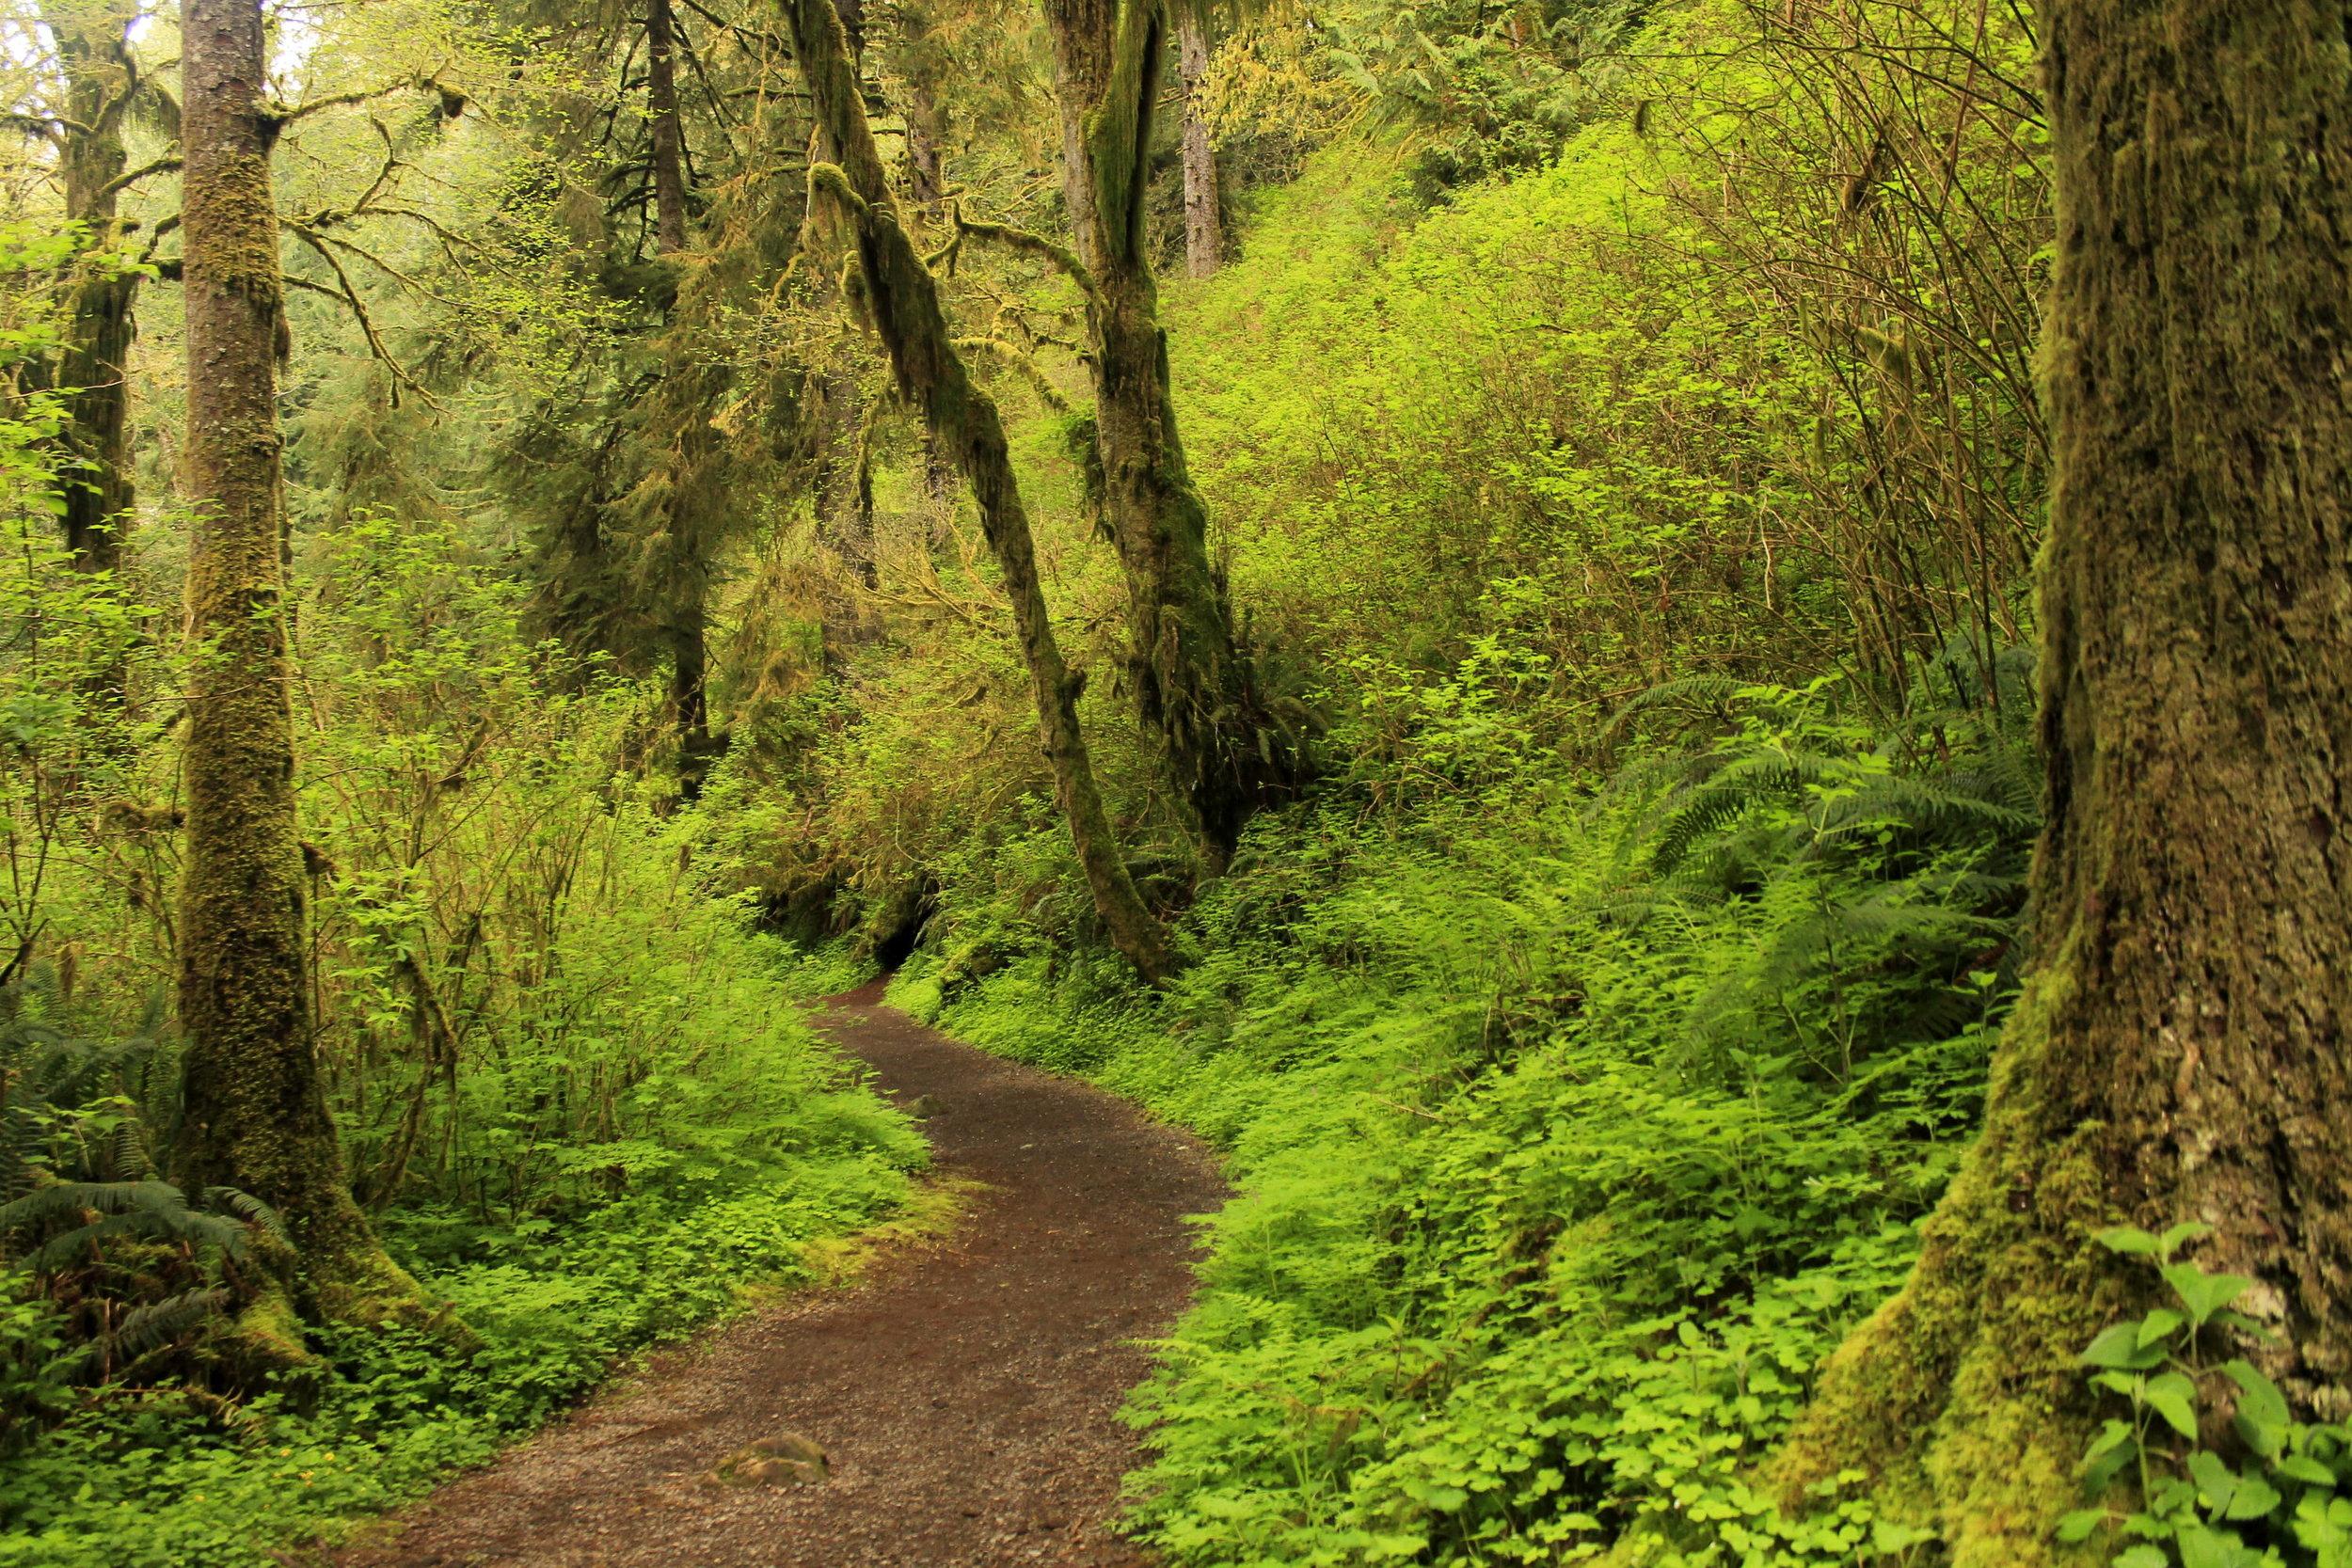 Lush forest near Munson Creek Falls